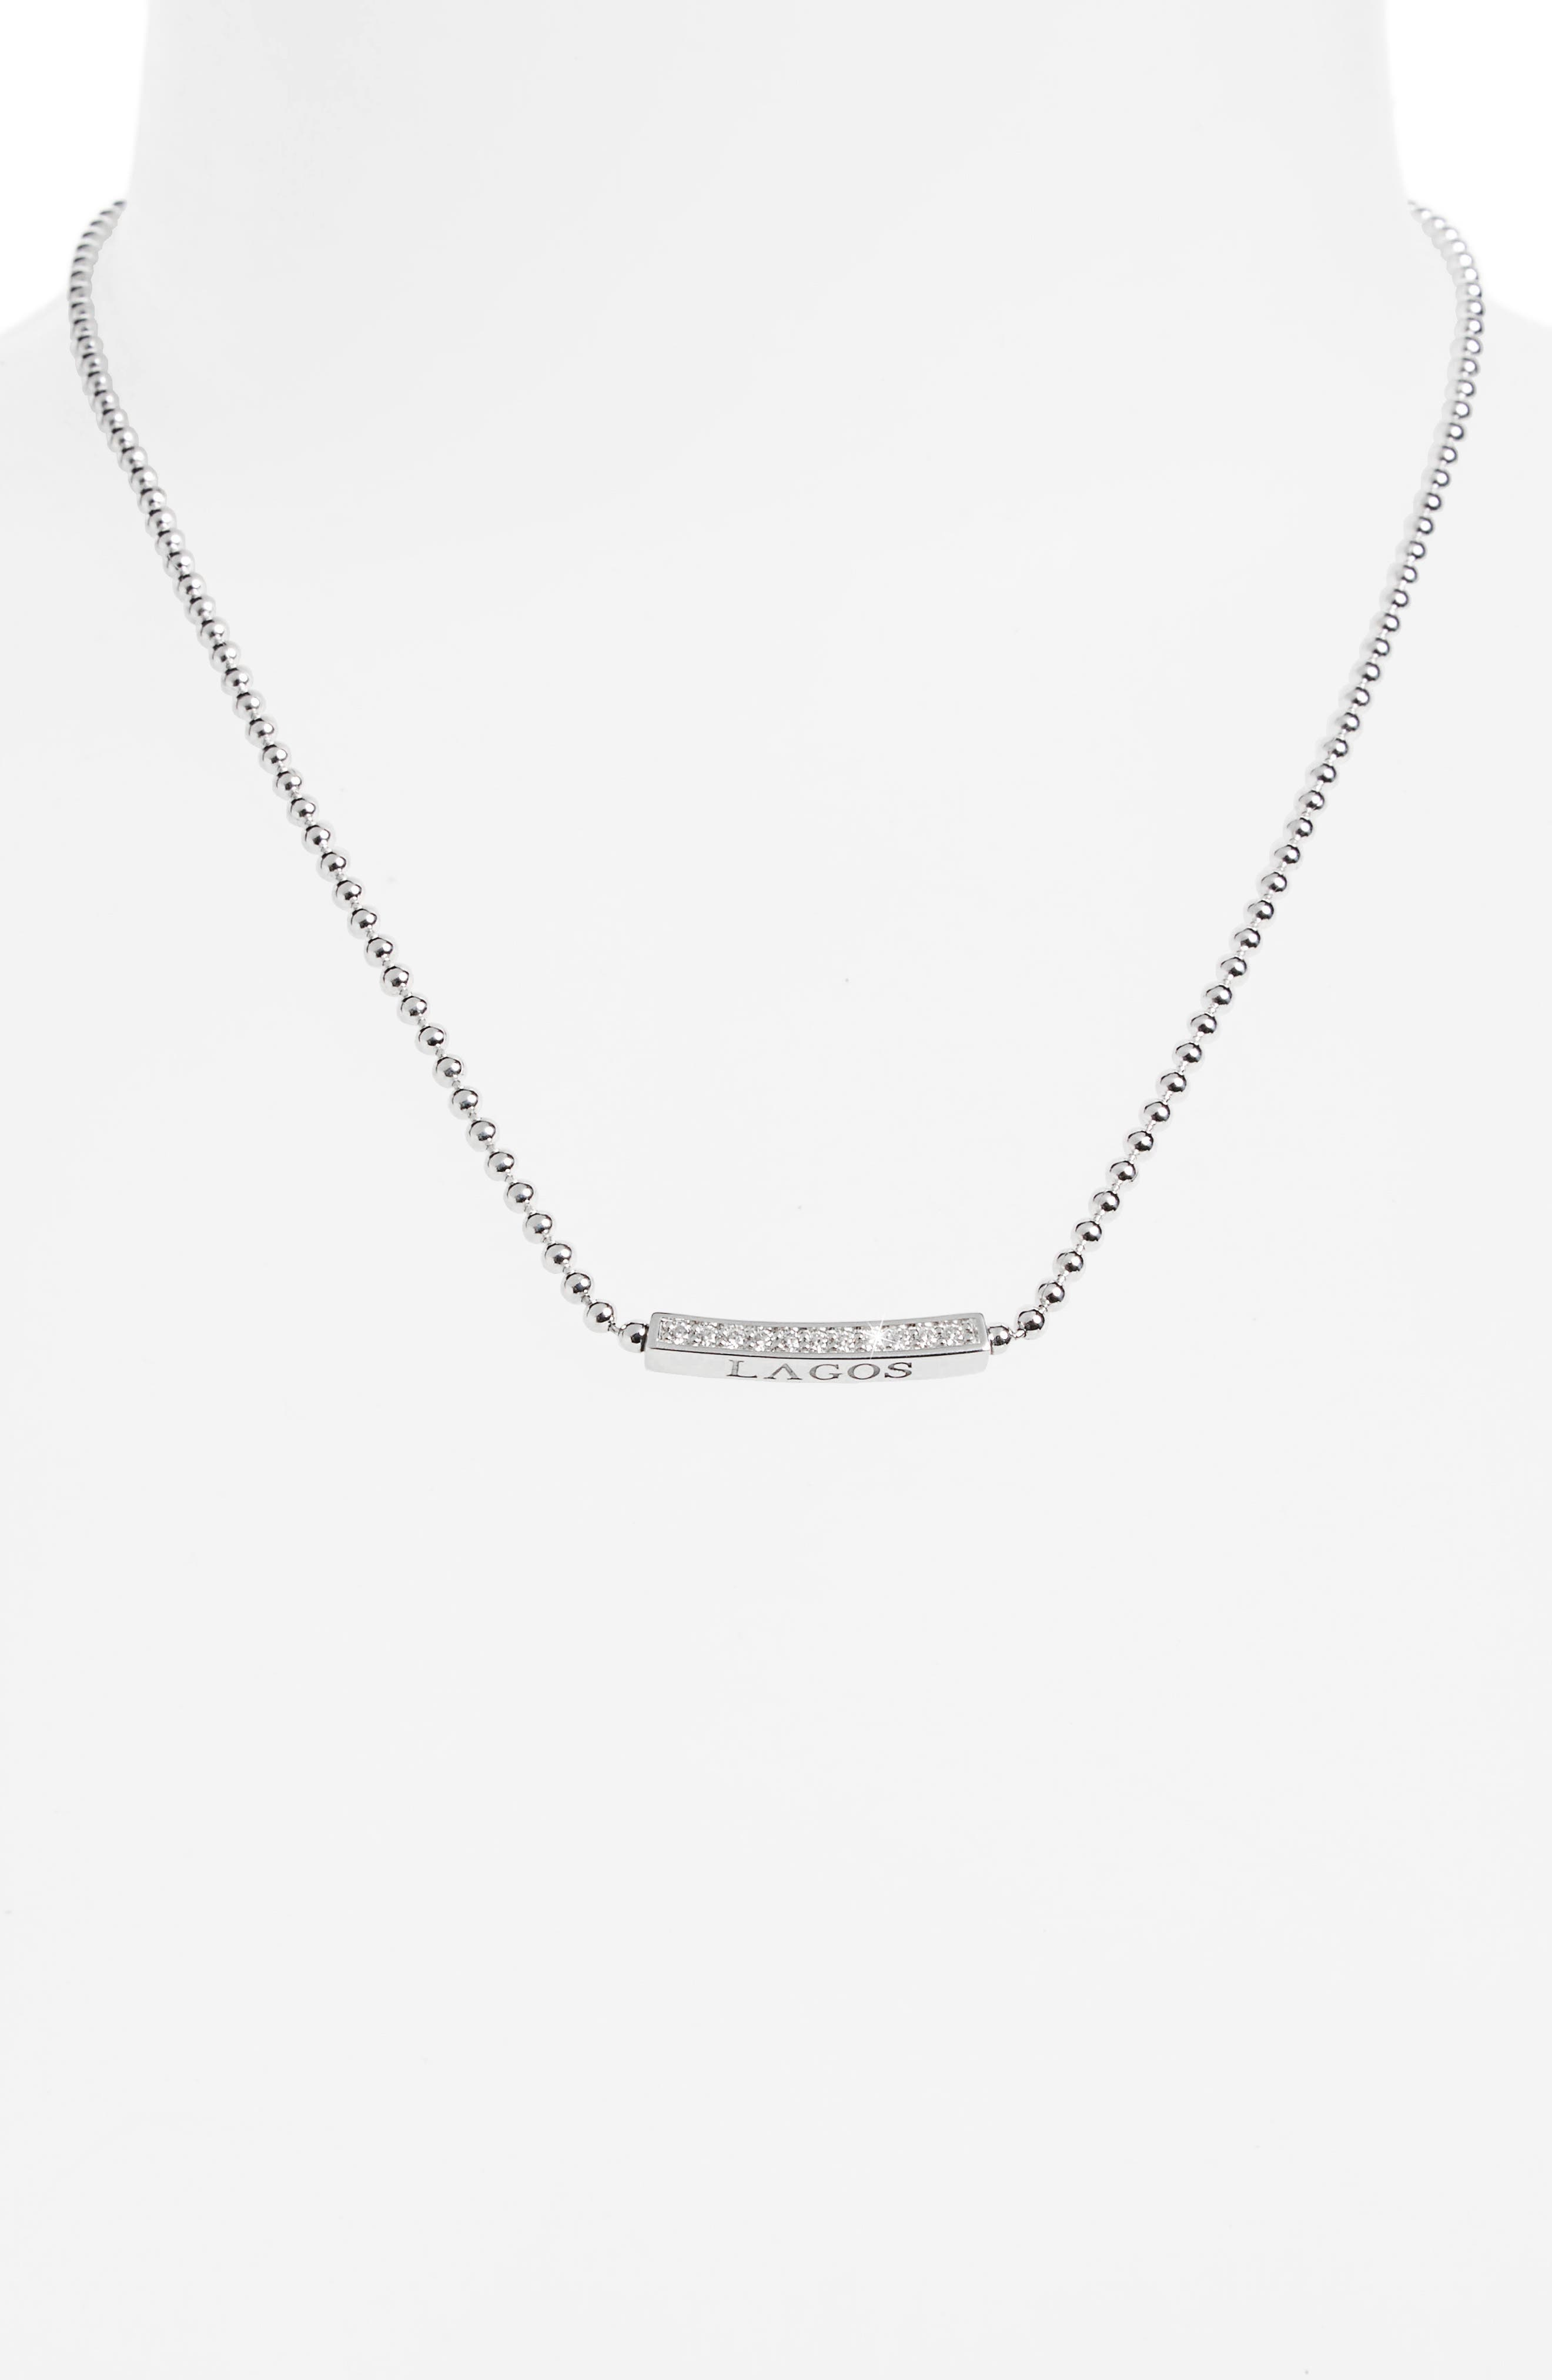 Caviar Spark Diamond Pendant Necklace,                             Alternate thumbnail 3, color,                             SILVER/ DIAMOND